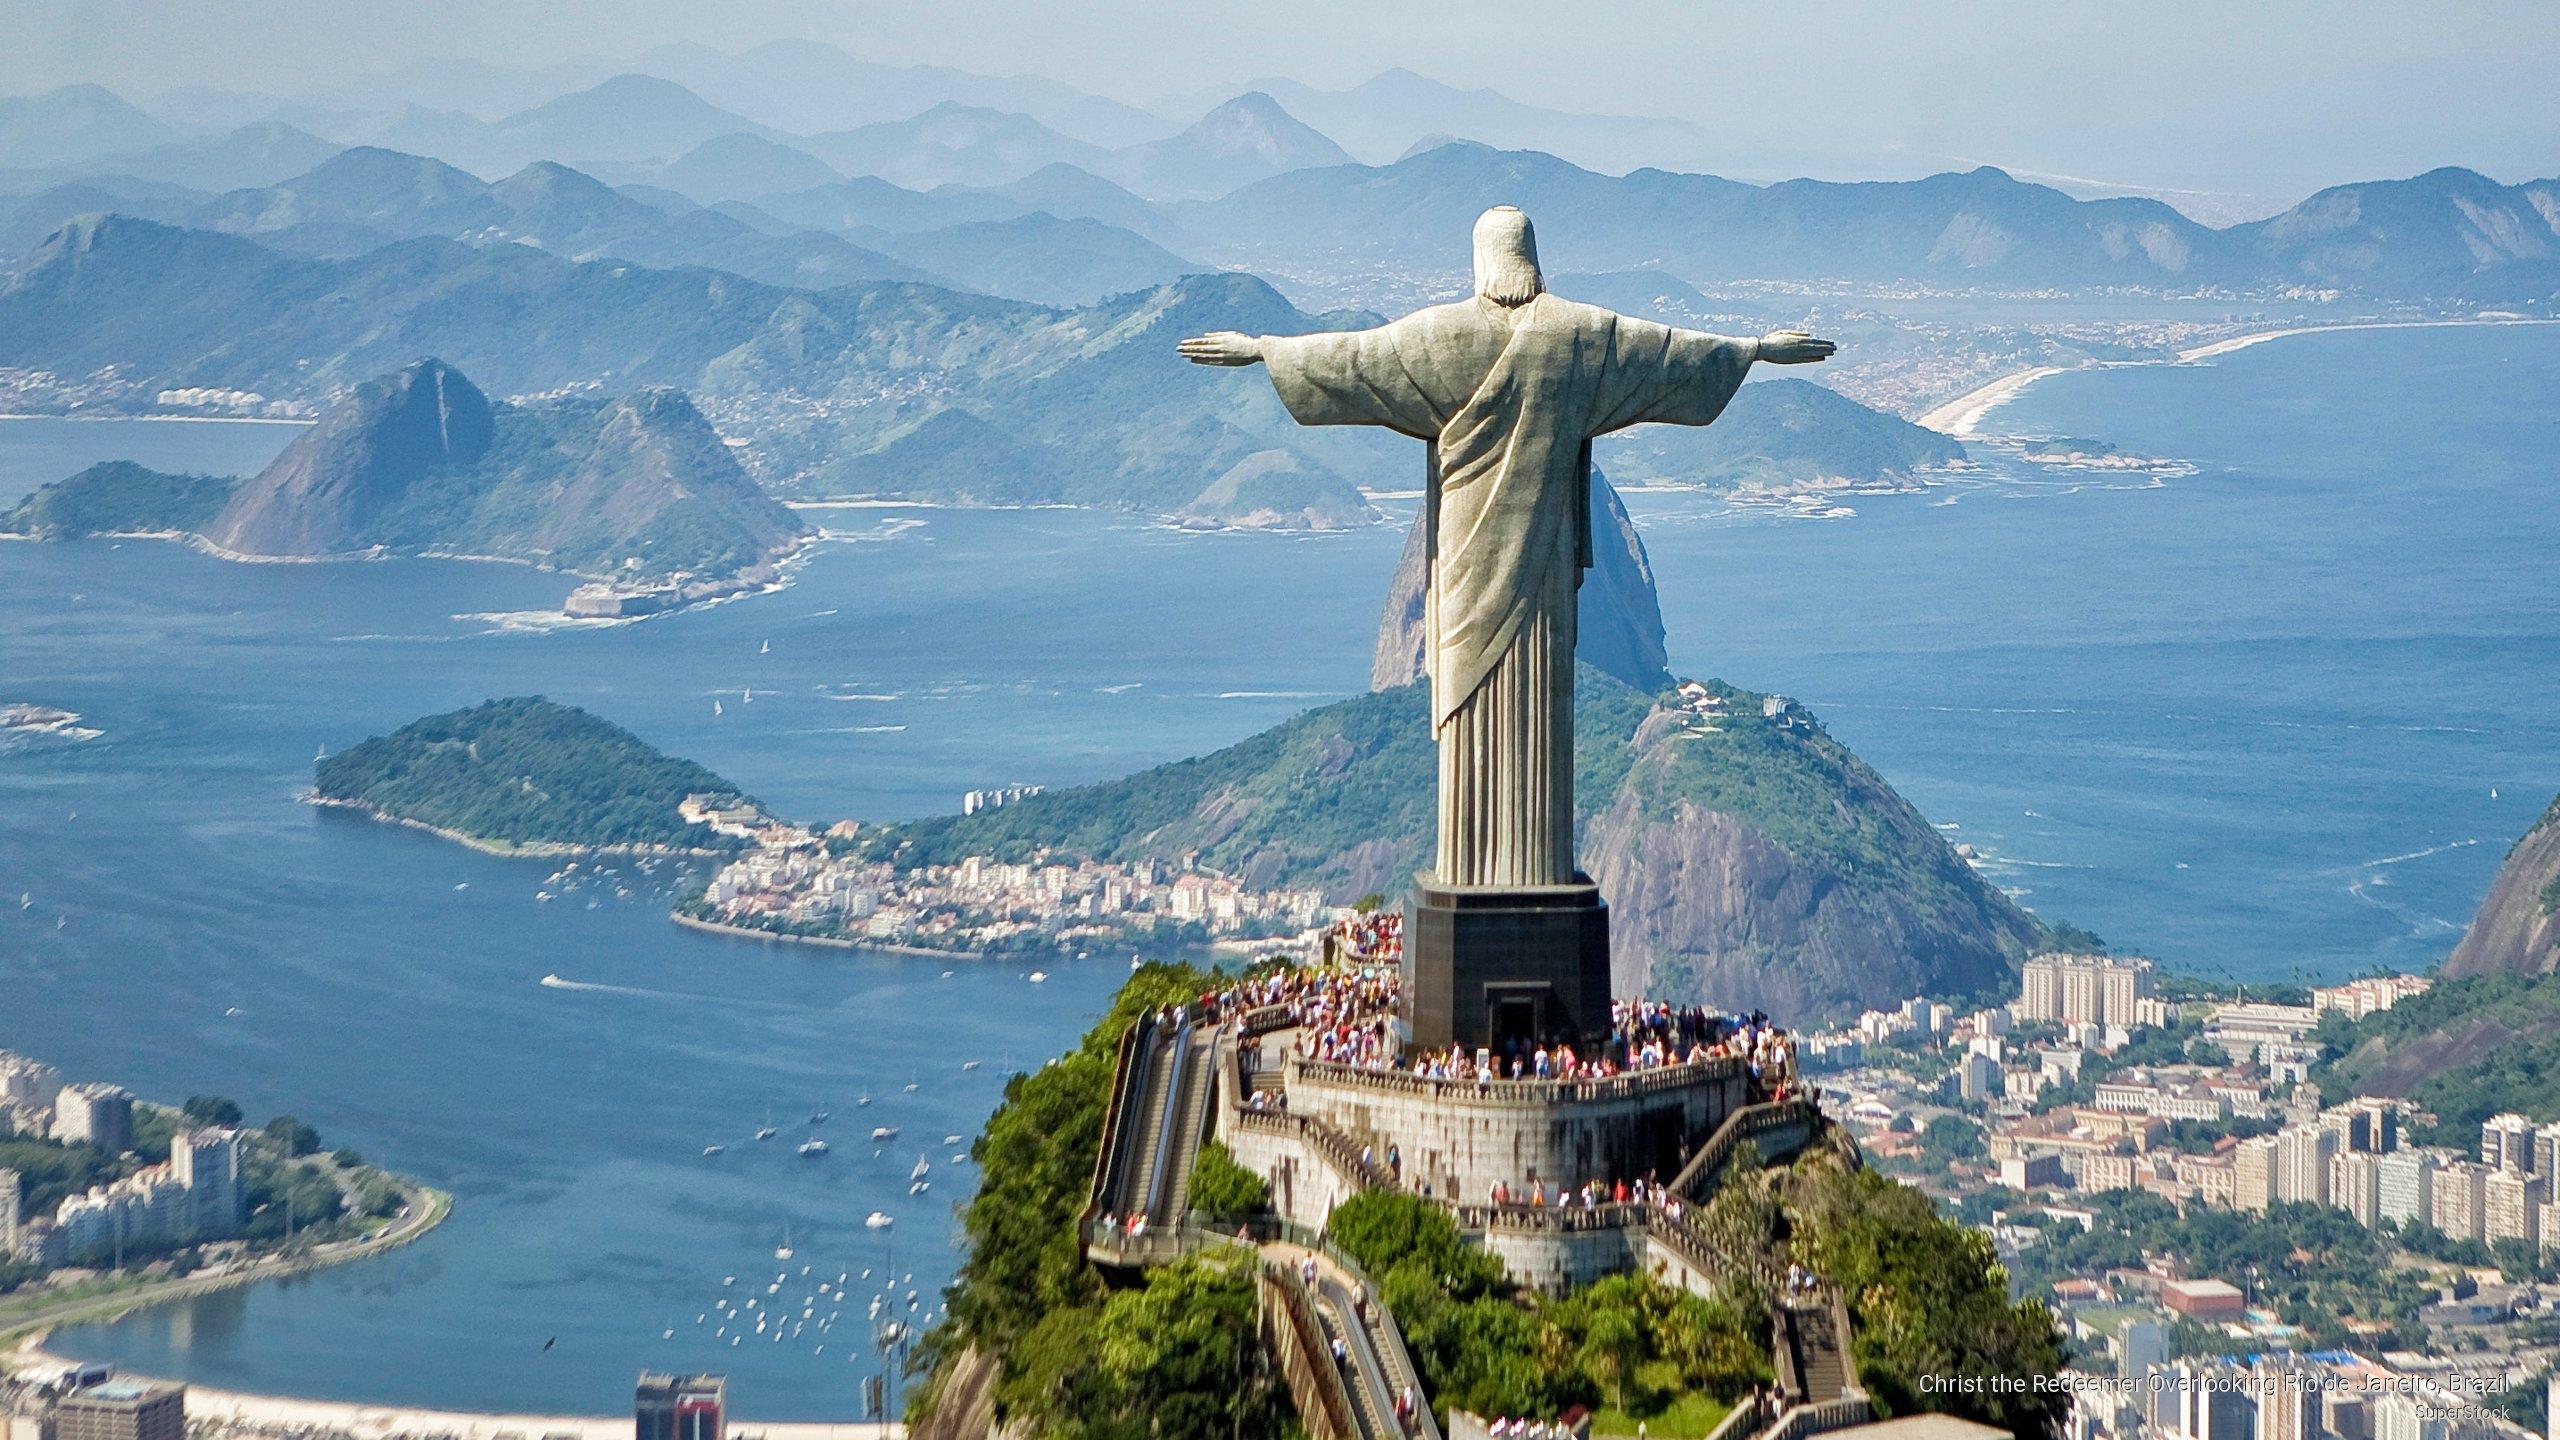 Jesus Rio de Janeiro Wallpaper 2560x1440